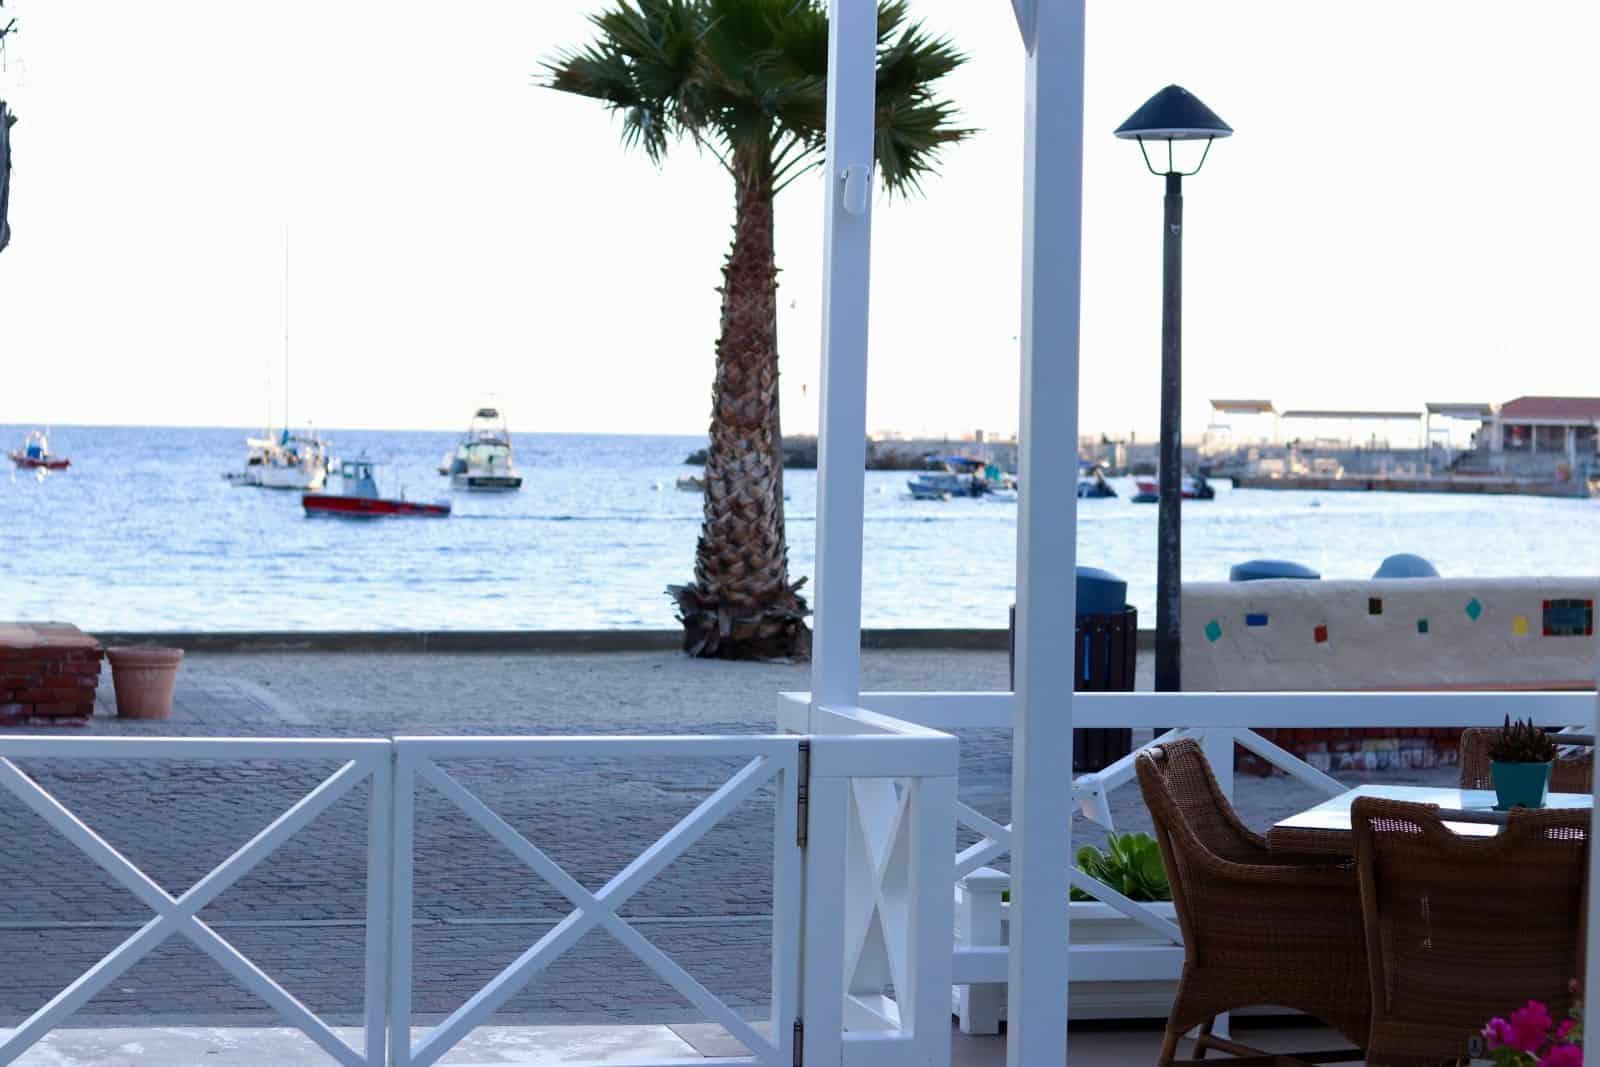 Catalina Island Pavilion Hotel